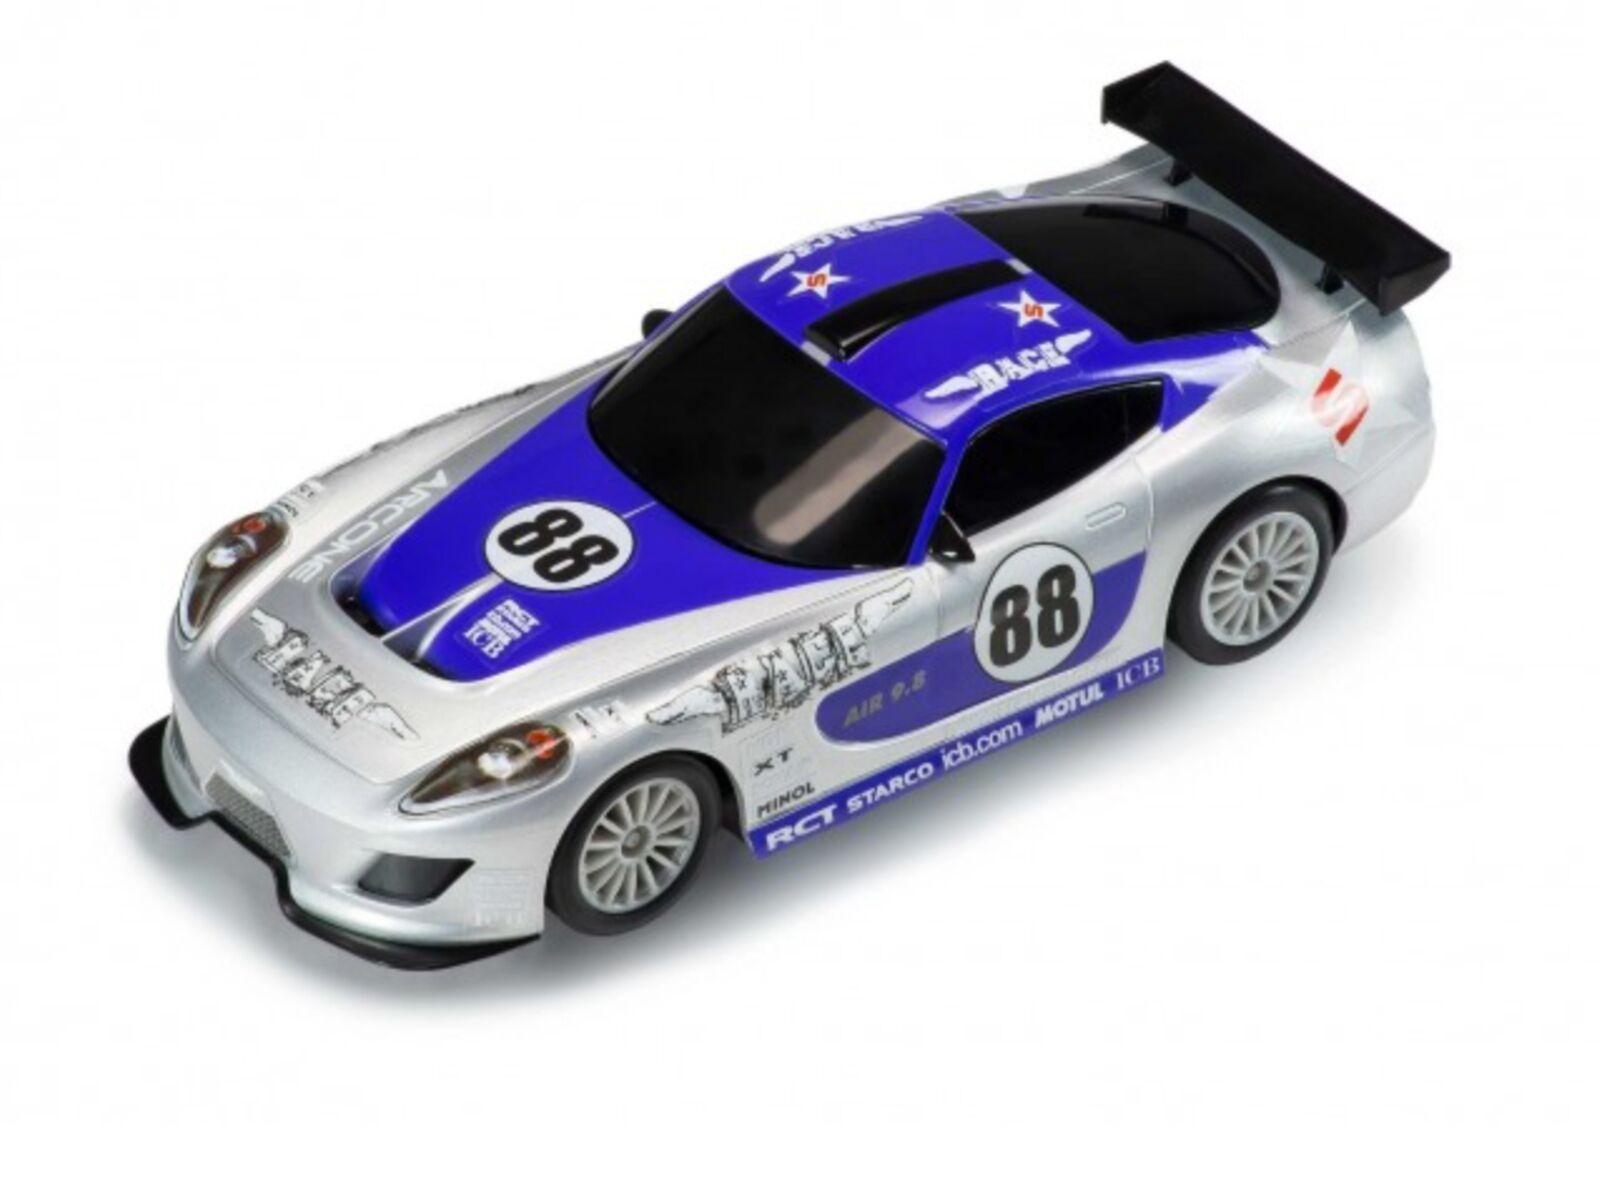 SCALEXTRIC 1 32 ARC One App Race Race Race Control RCS Slot